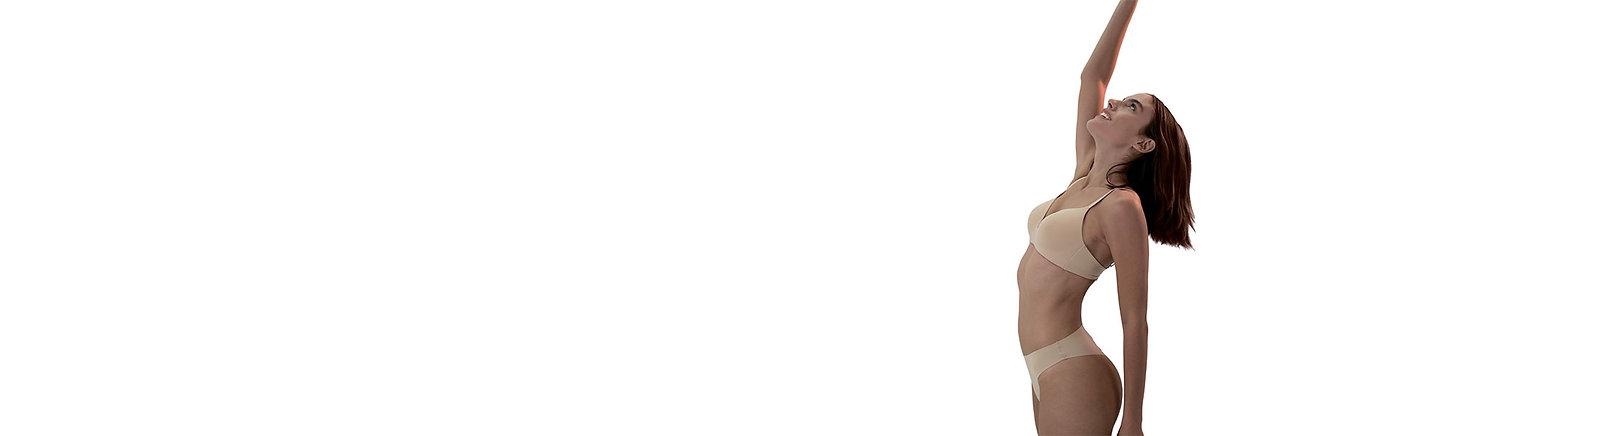 Банер-результаты.jpg